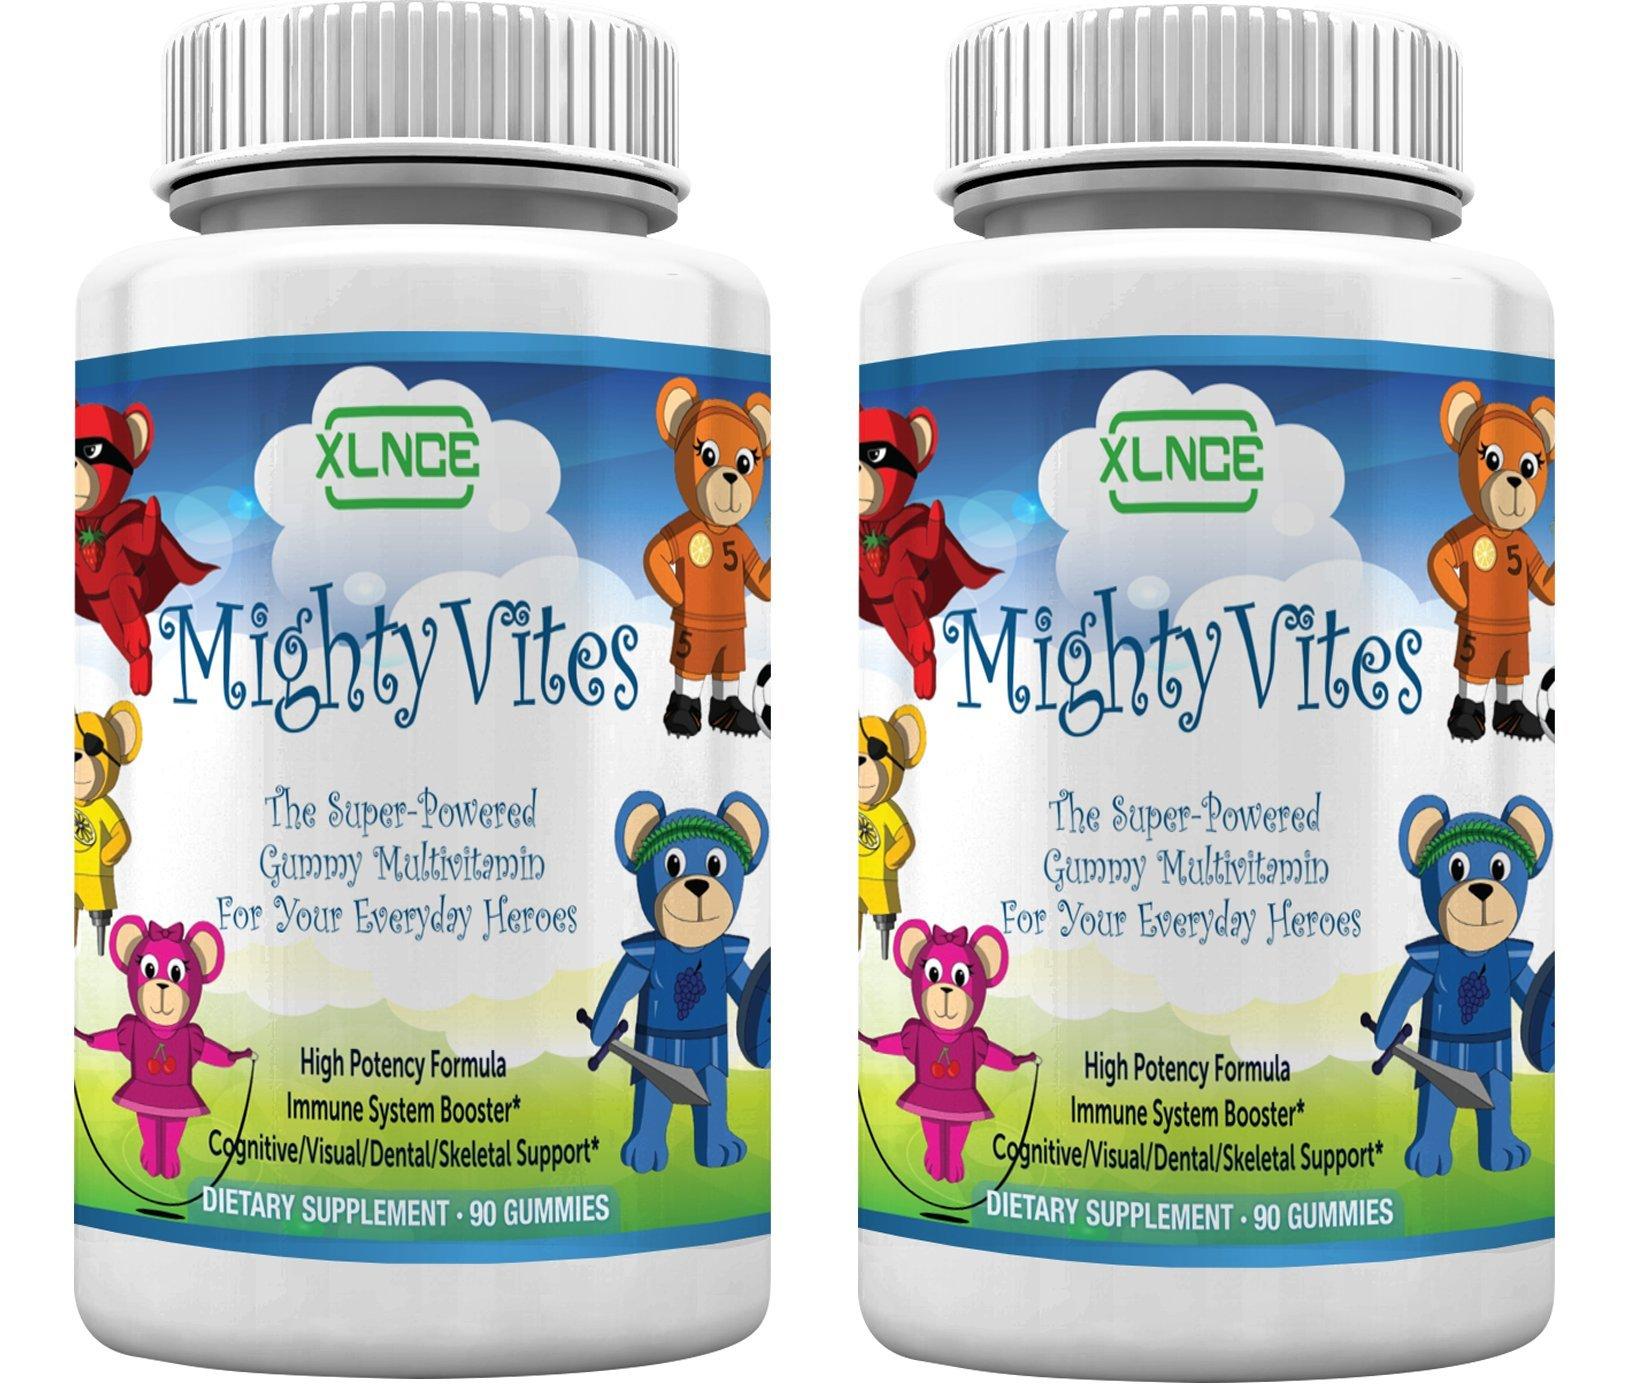 Pack of 2 Children Multivitamin Gummies by XLNCE - Gummy Vitamins Boost Immune System Health in Kids, Toddlers, Teens, Men & Women. Best Natural Chewable Multivitamins. Add Multi Items to Cart NOW!